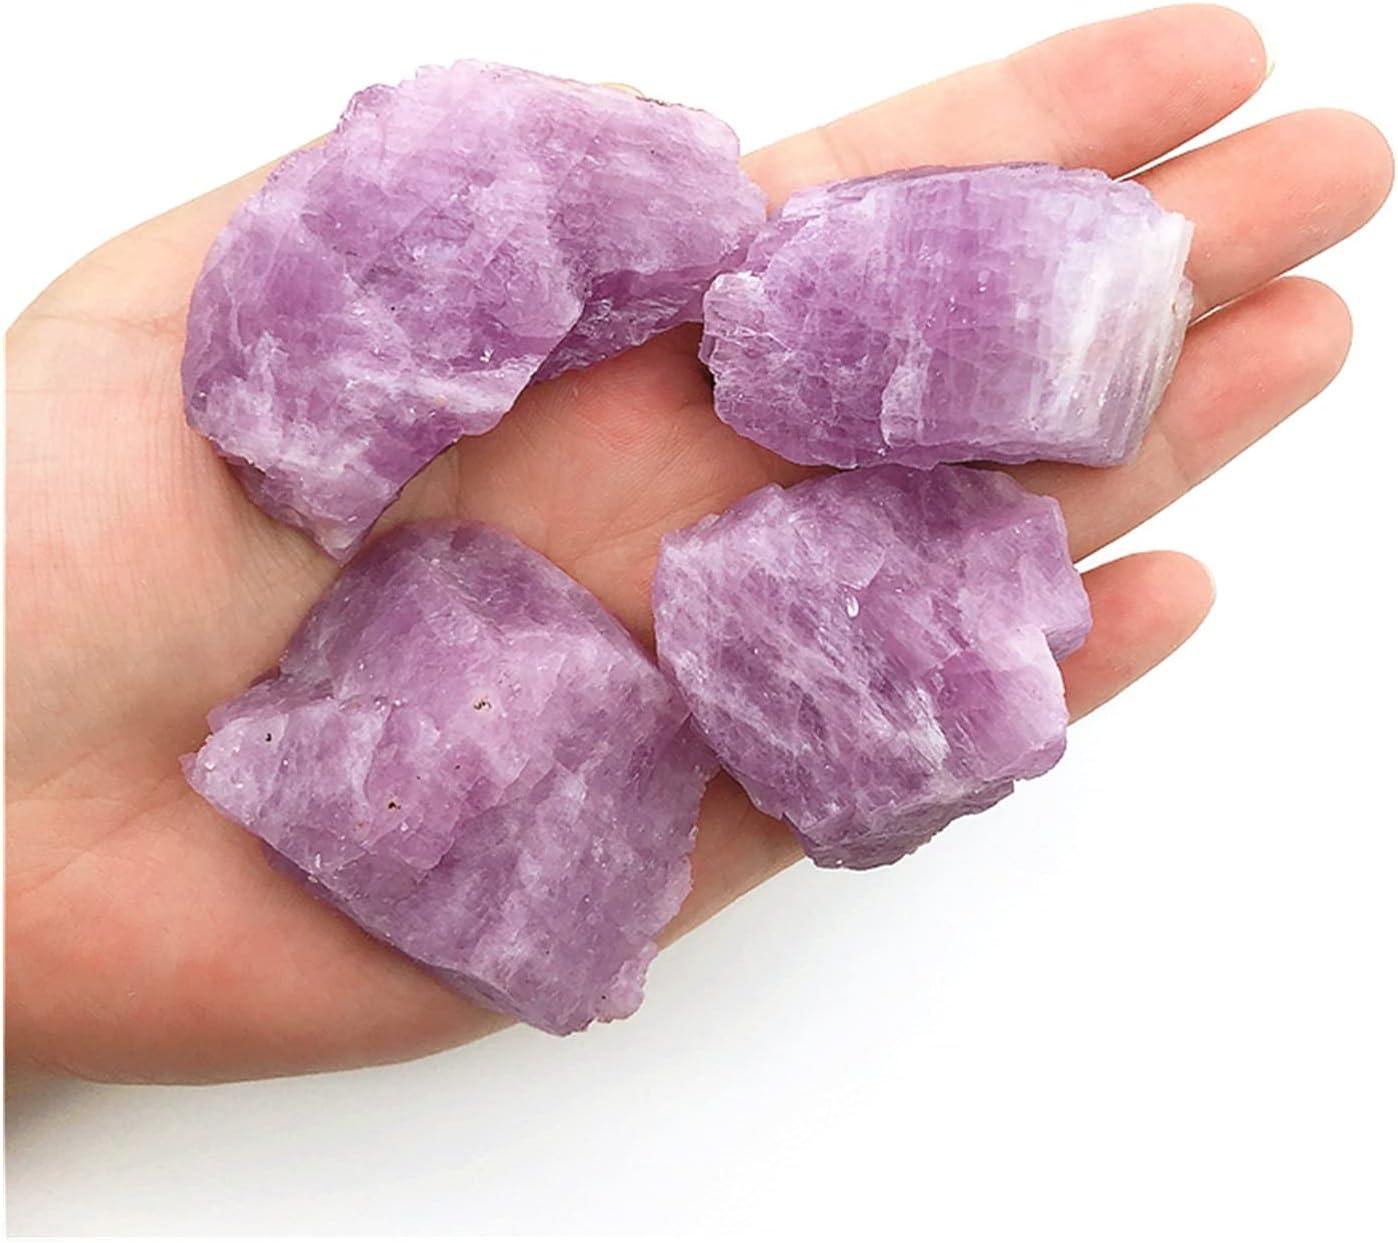 Max 73% OFF DMYONGLIAN Natural Stone Colorado Springs Mall Beautiful Spodumen Color Purple